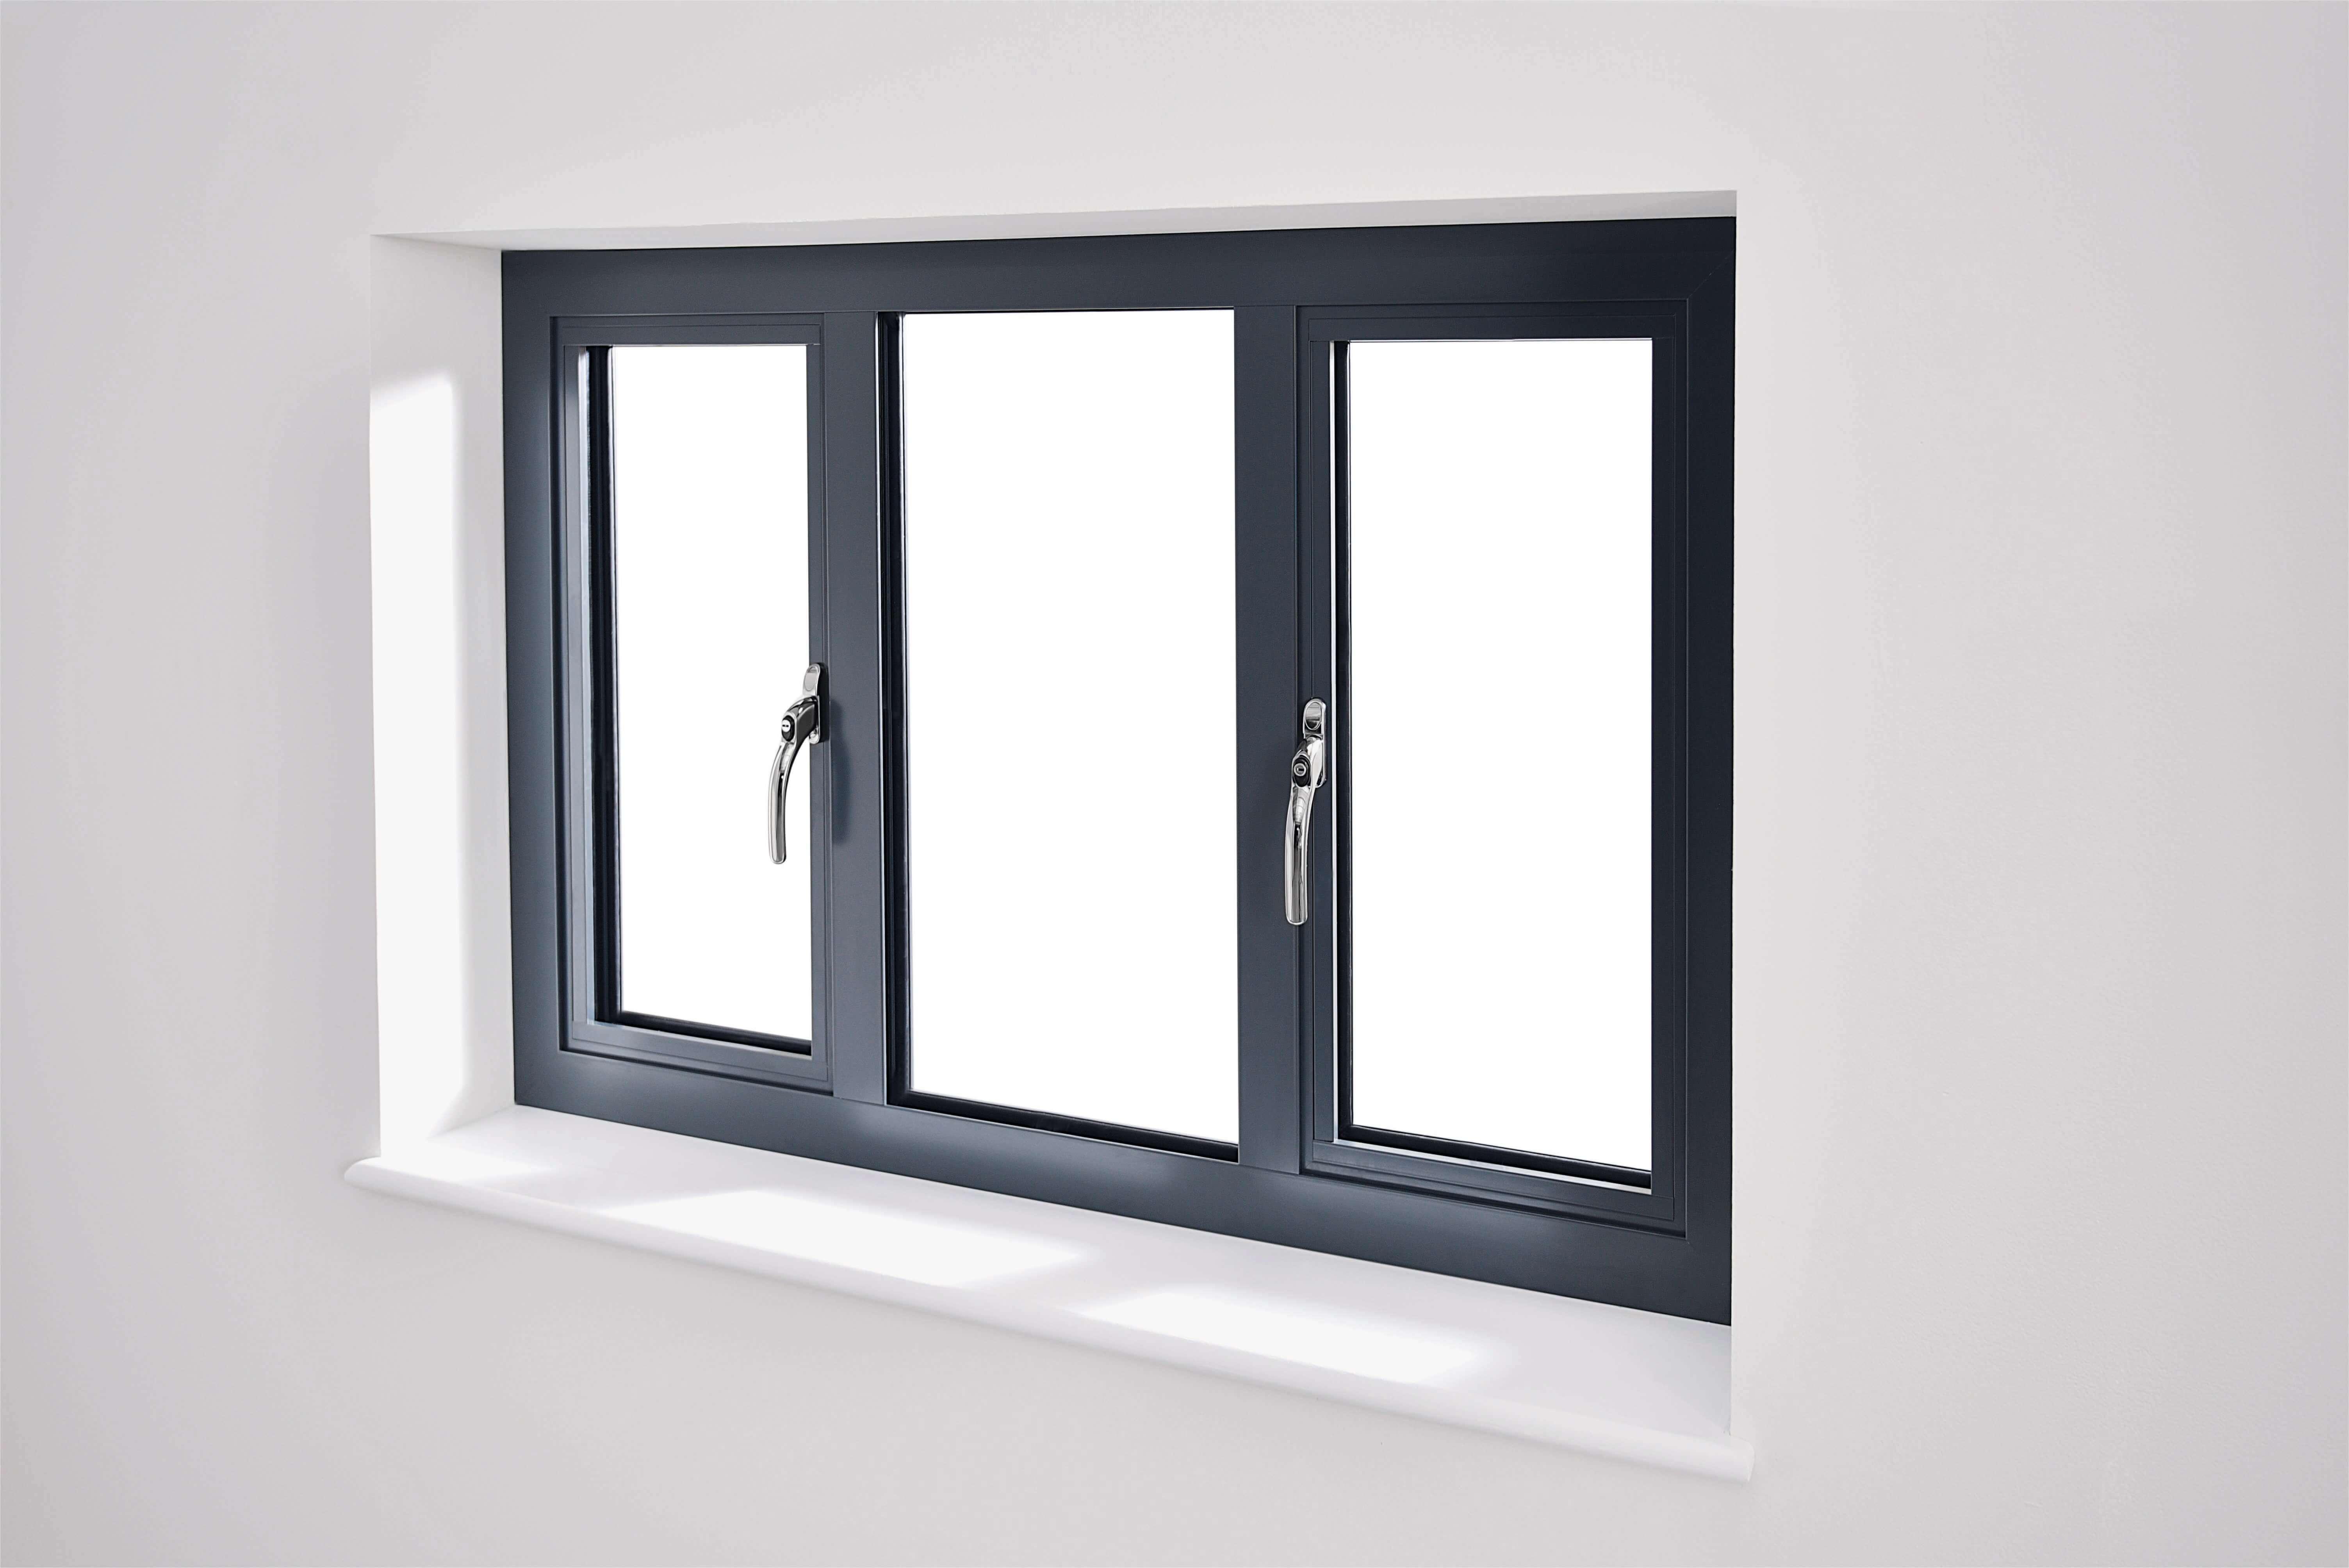 Slimline Aluminium Windows, Crawley